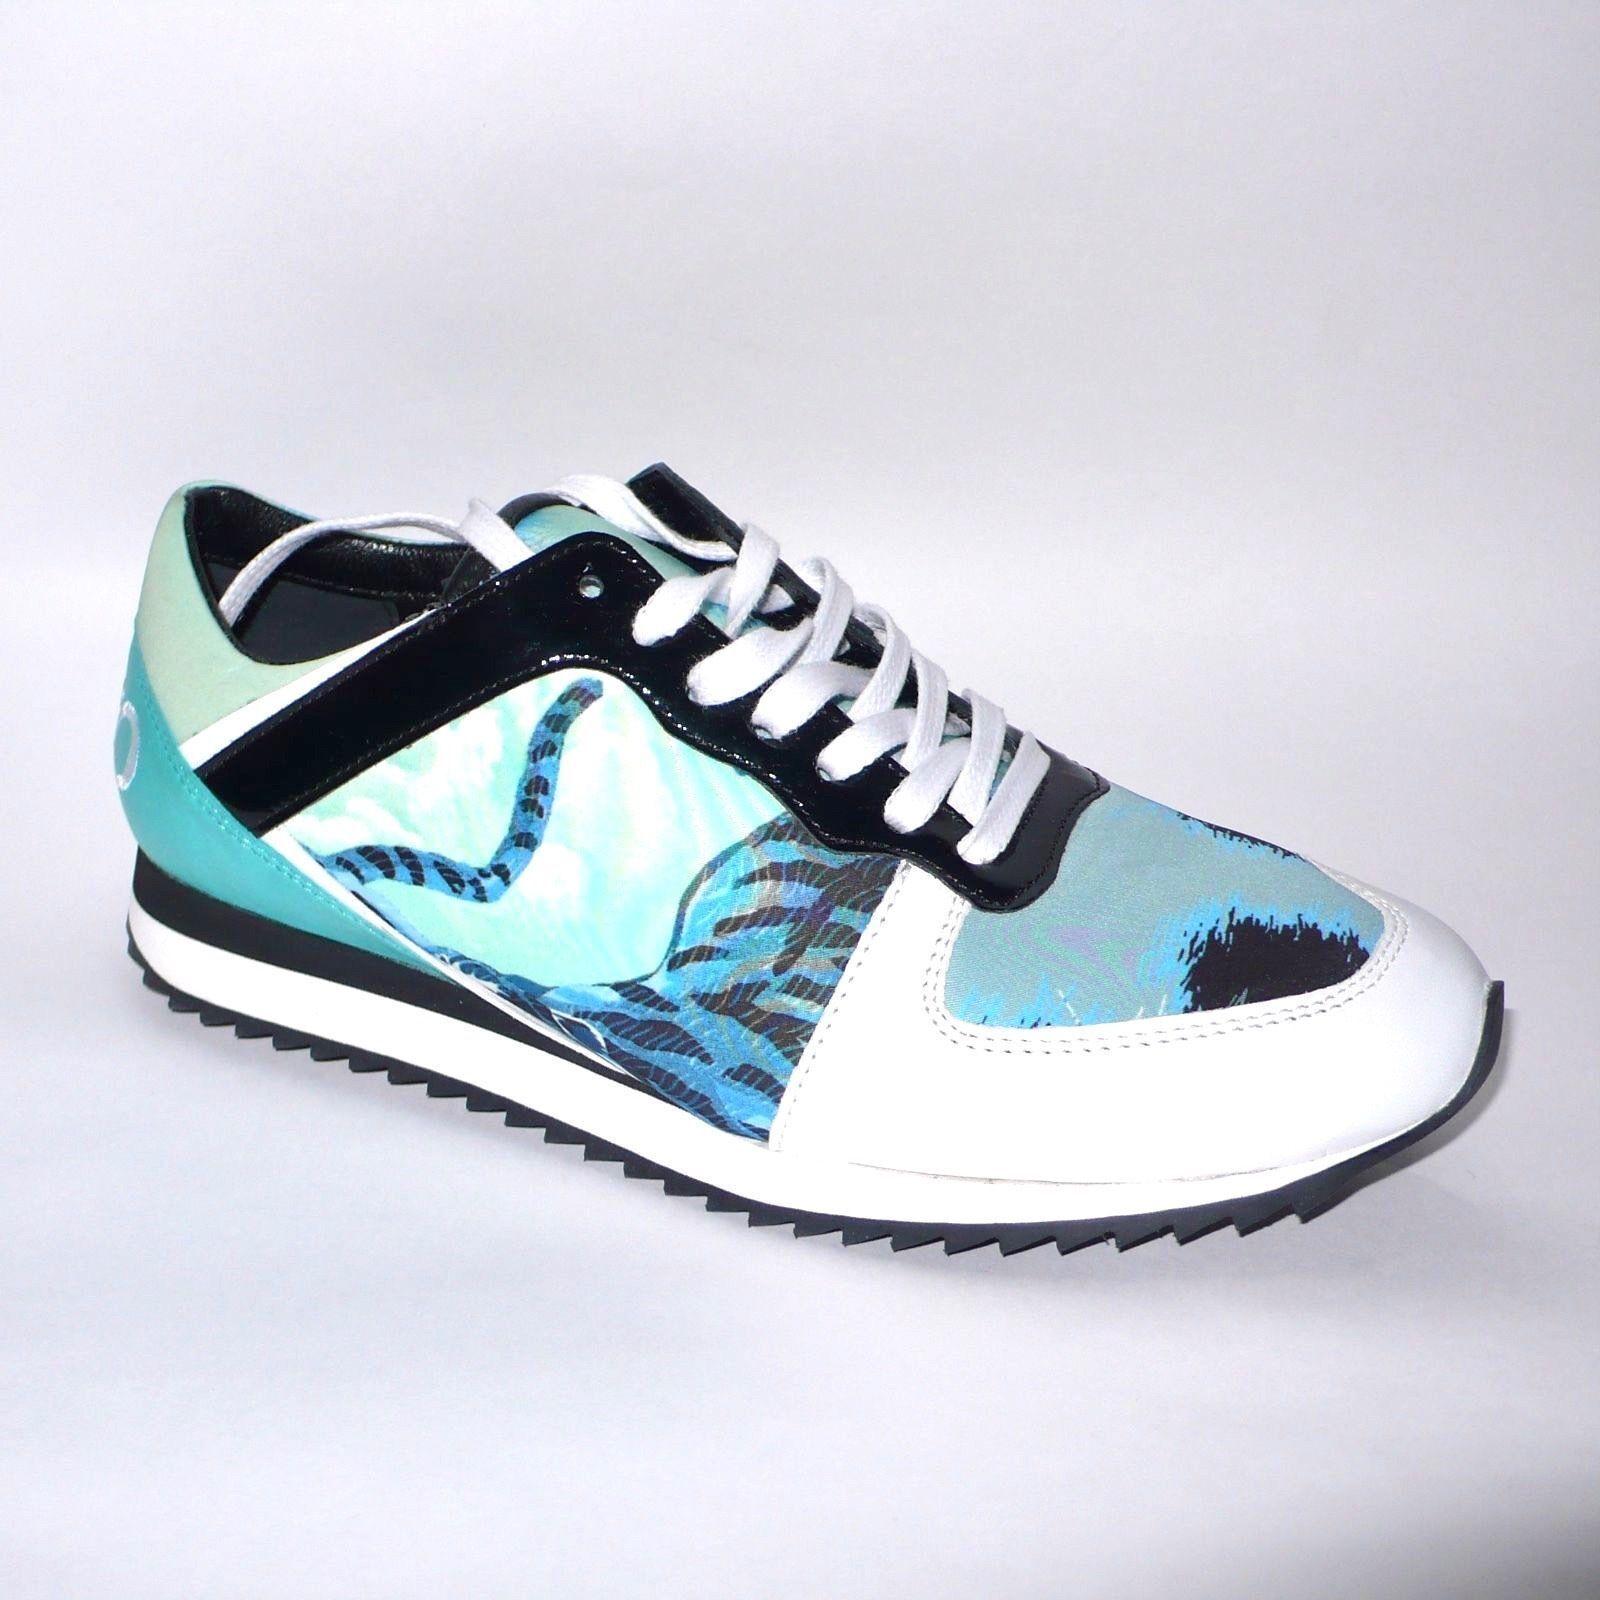 Kenzo  Tiger scarpe da ginnastica Sport scarpe blu verde EU 38  all'ingrosso a buon mercato